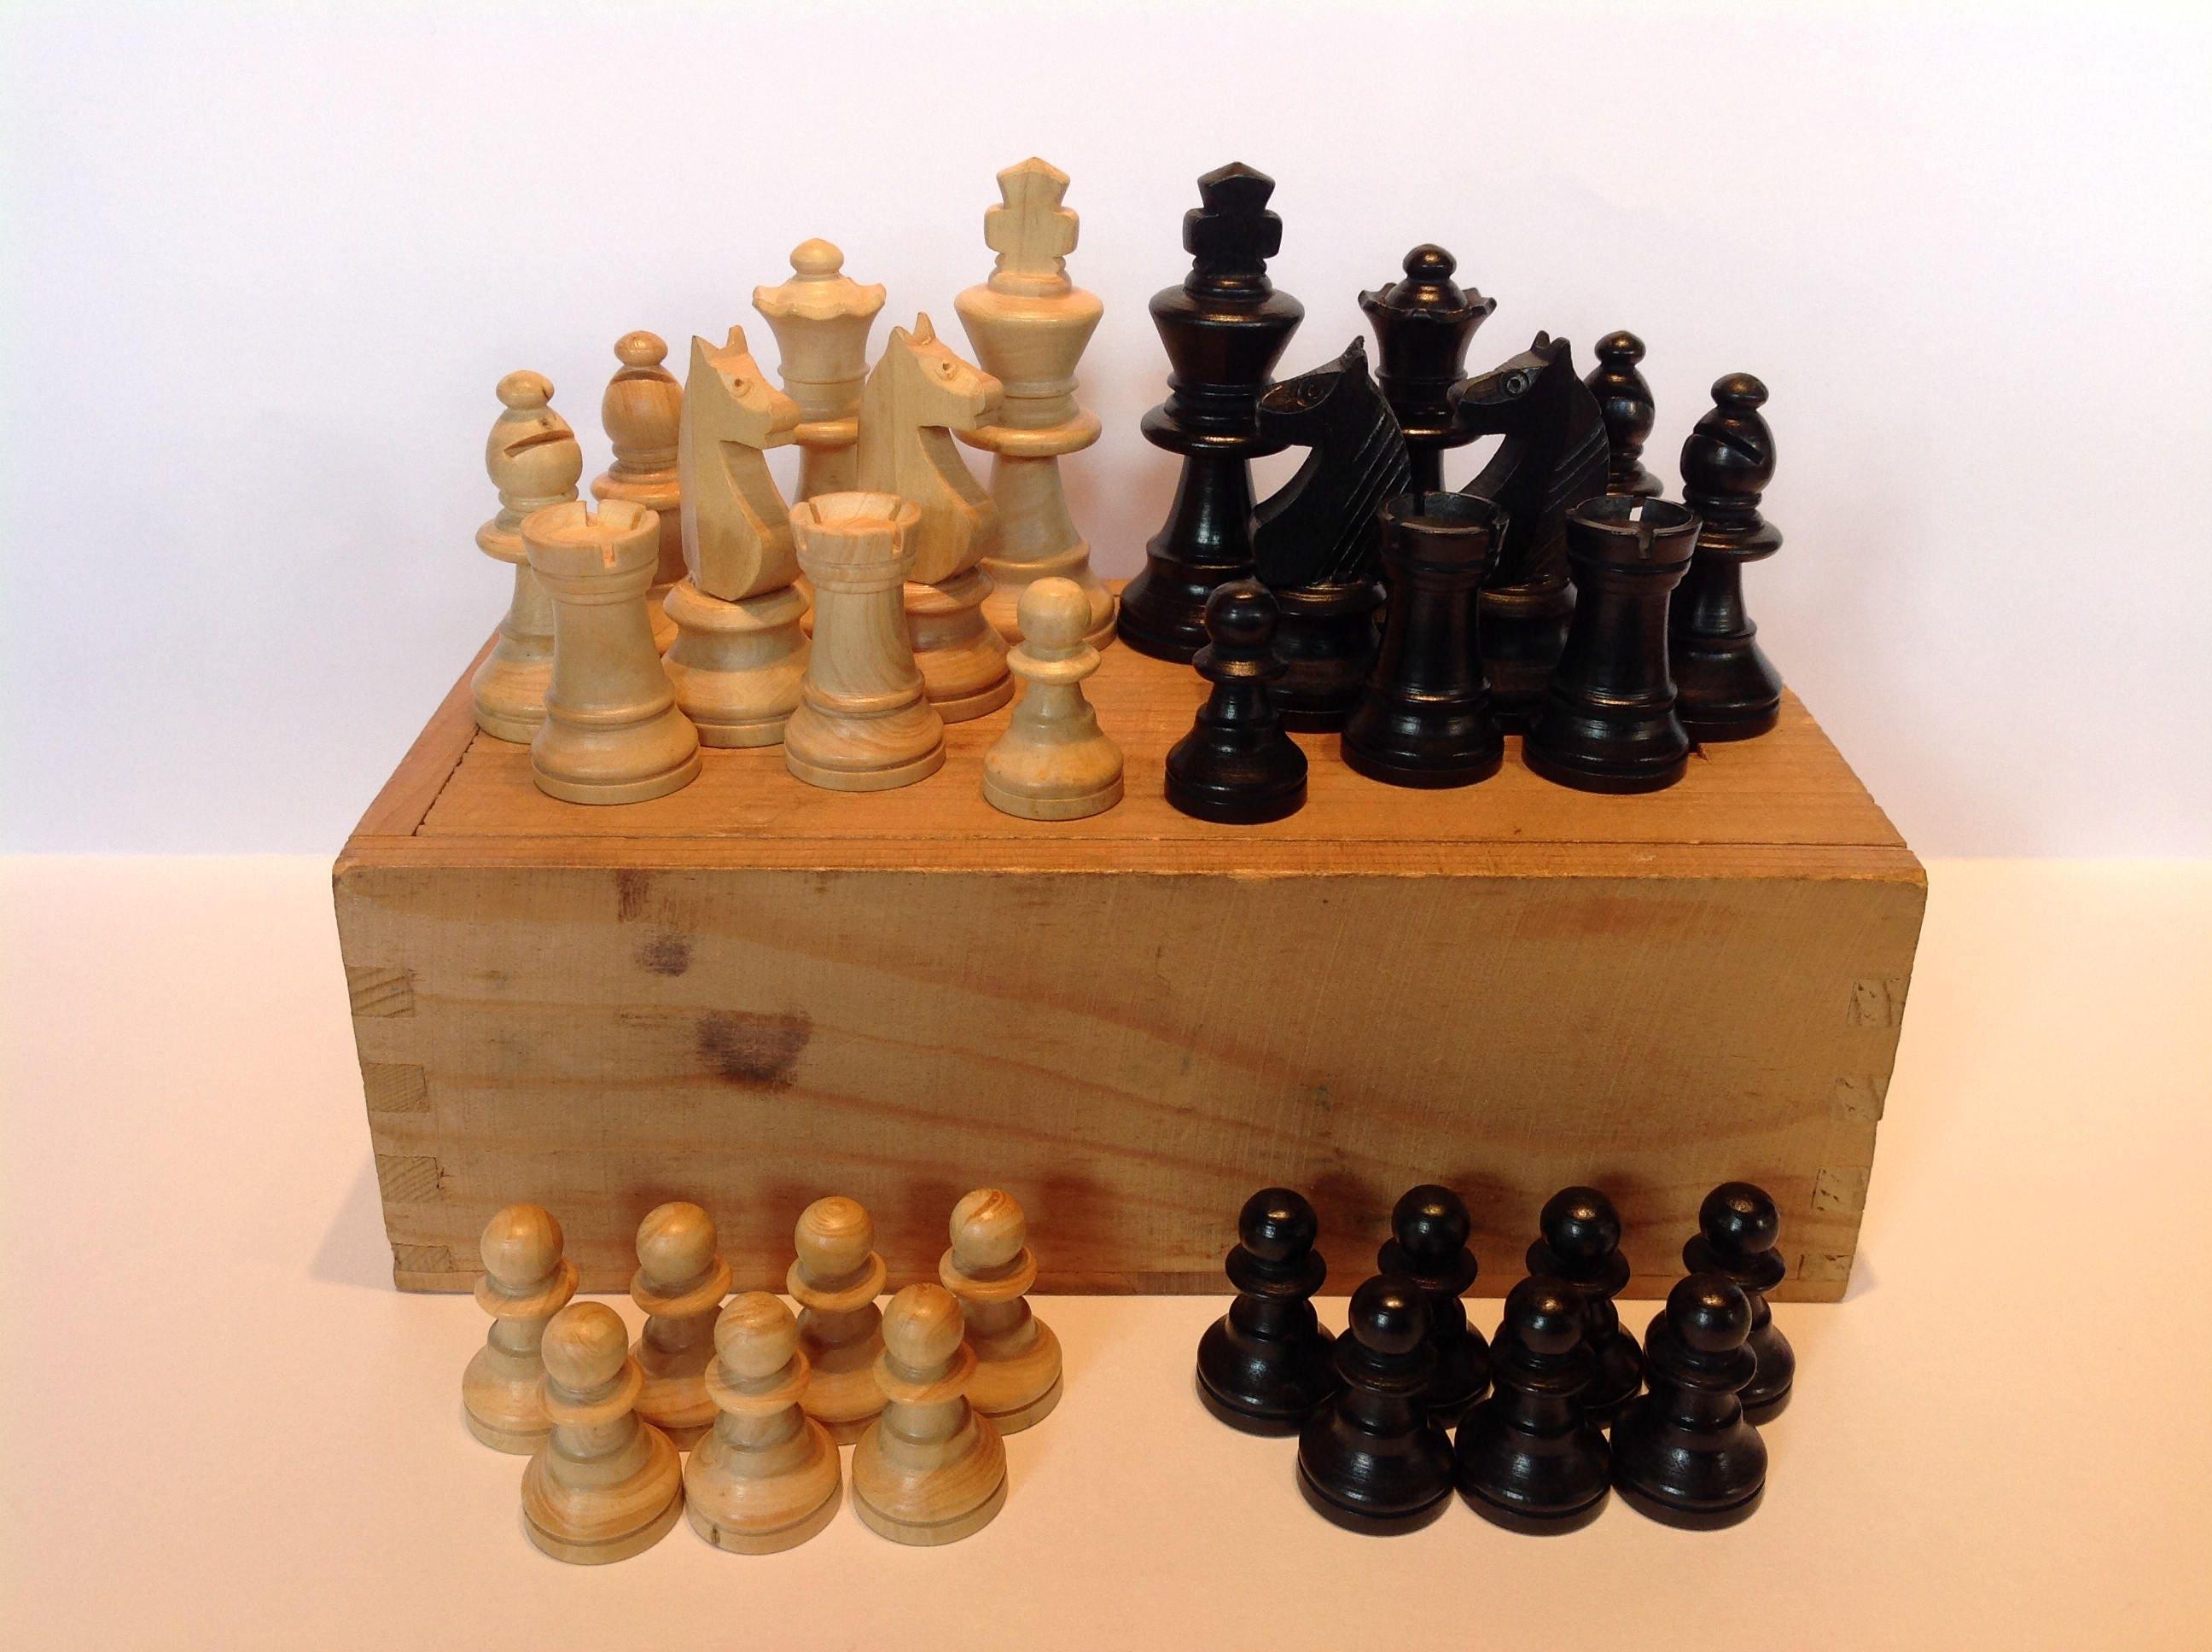 1960s French Staunton Pattern Boxwood Chess Set. Wooden Chessmen. Retro Chess Pieces. Boxwood Chessmen. Small Chess Pieces. Pocket Chess Set